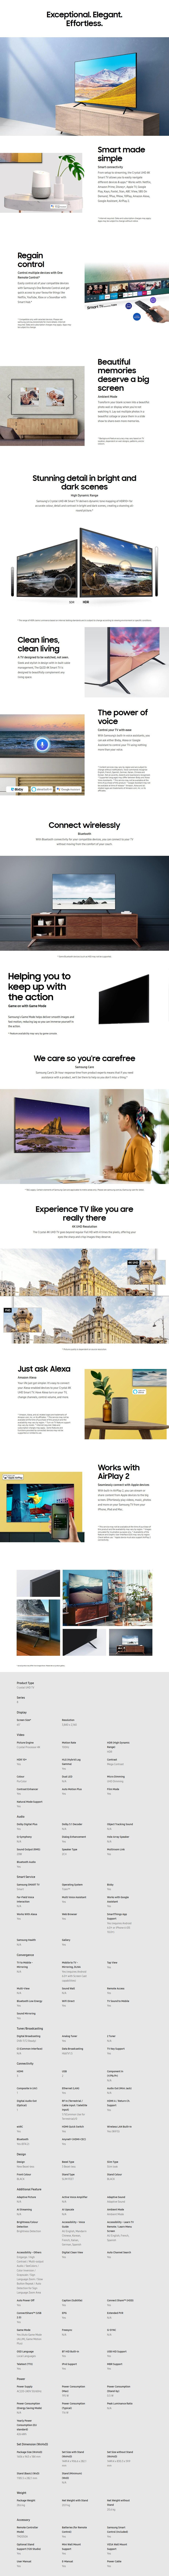 "Samsung Series 8 UA65TU8000W 65"" 120Hz 4K UHD Smart LED TV - 2020 Model - Overview 1"